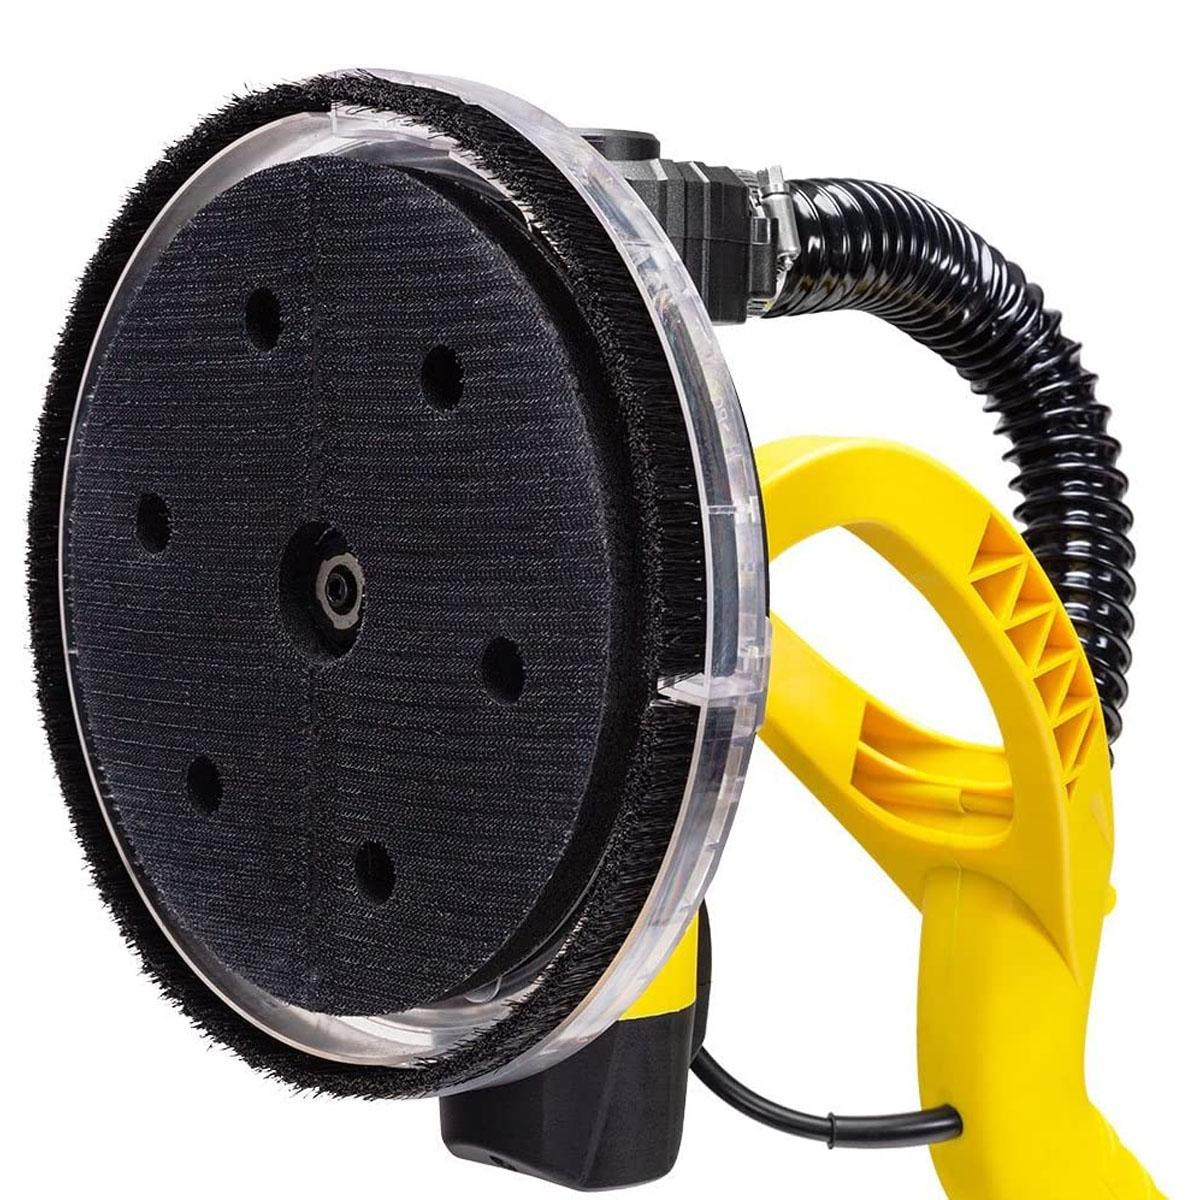 Lixadeira Parede Teto Drywall Elétrica Telescópica 750w Lw2